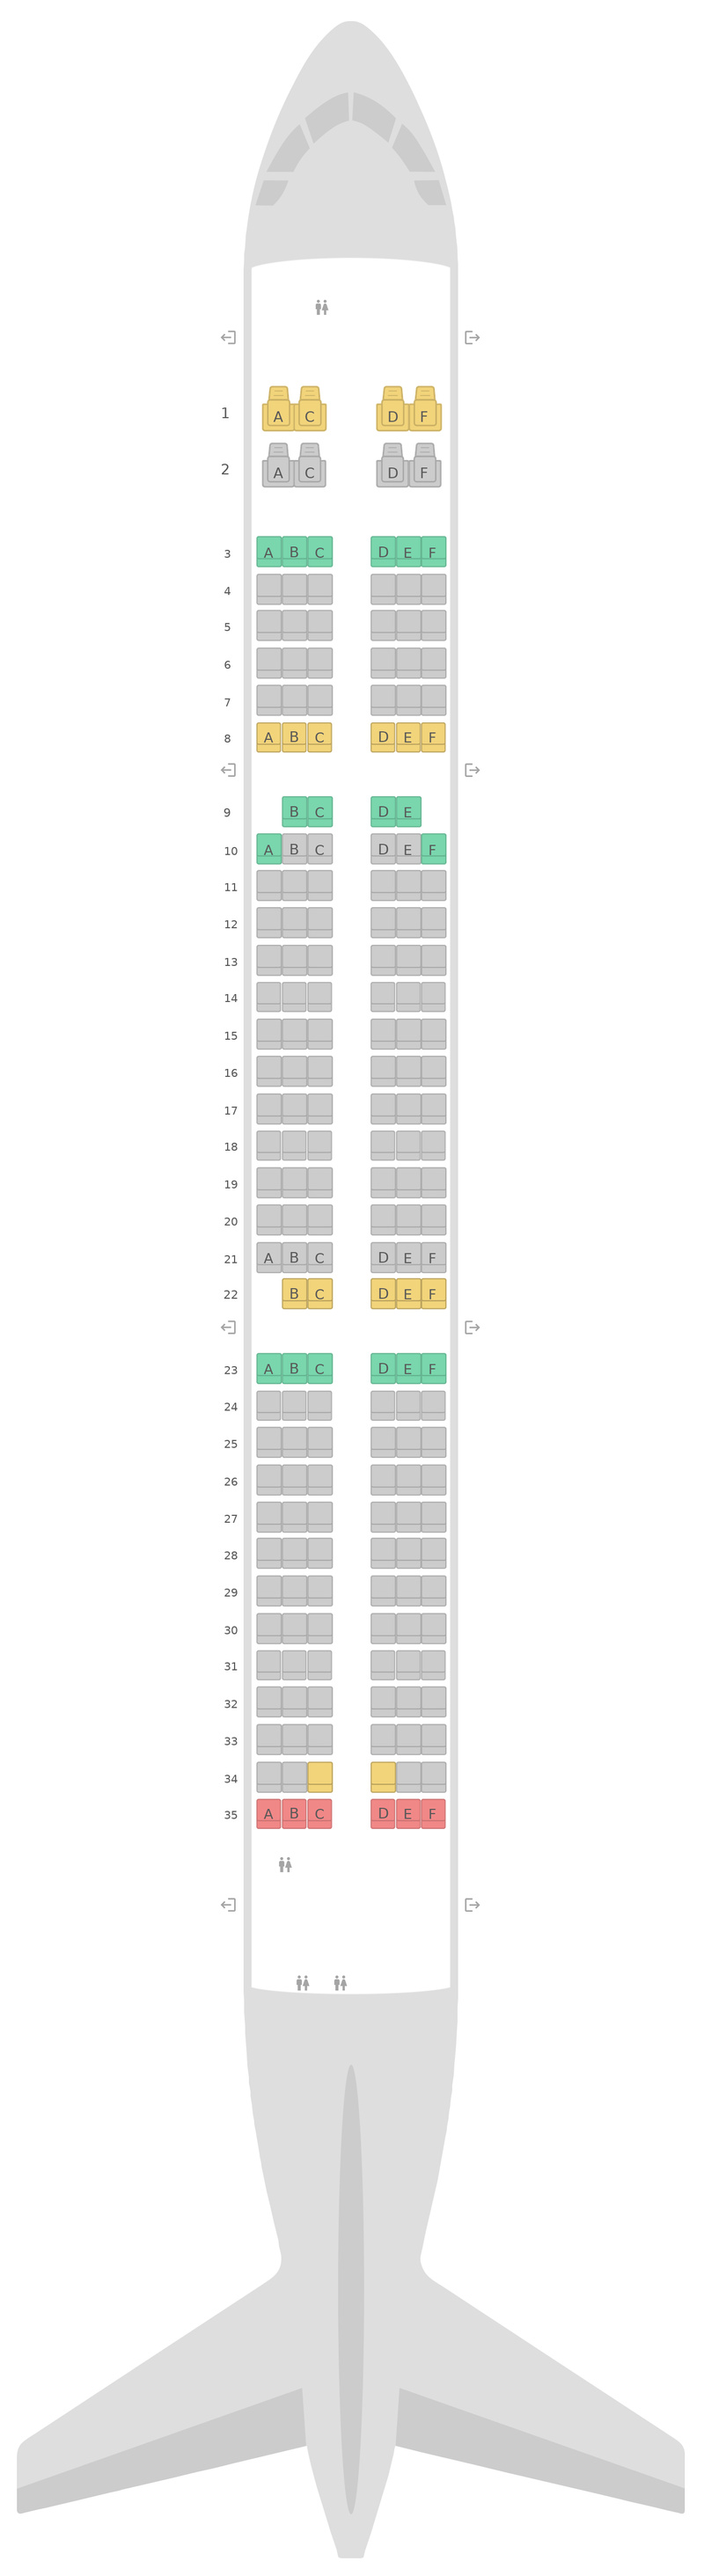 Mapa de asientos Airbus A321neo S7 Airlines